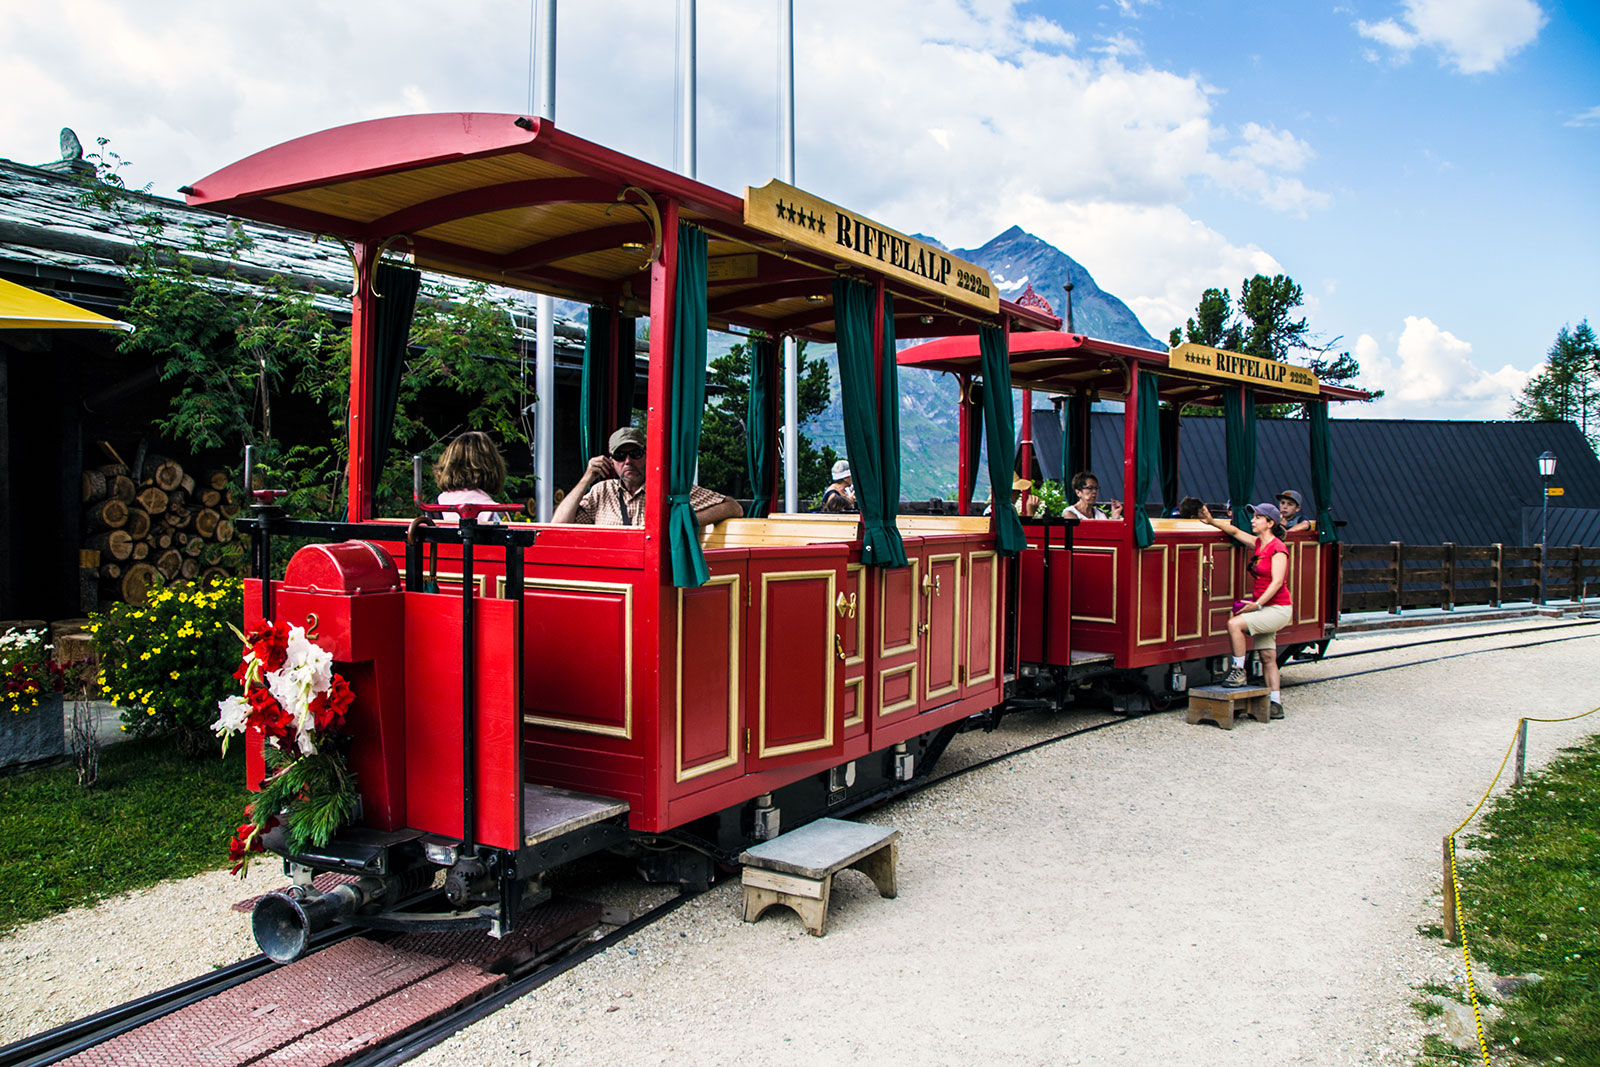 Tren del hotel Riffelalp 2222m – Zermatt en dos días